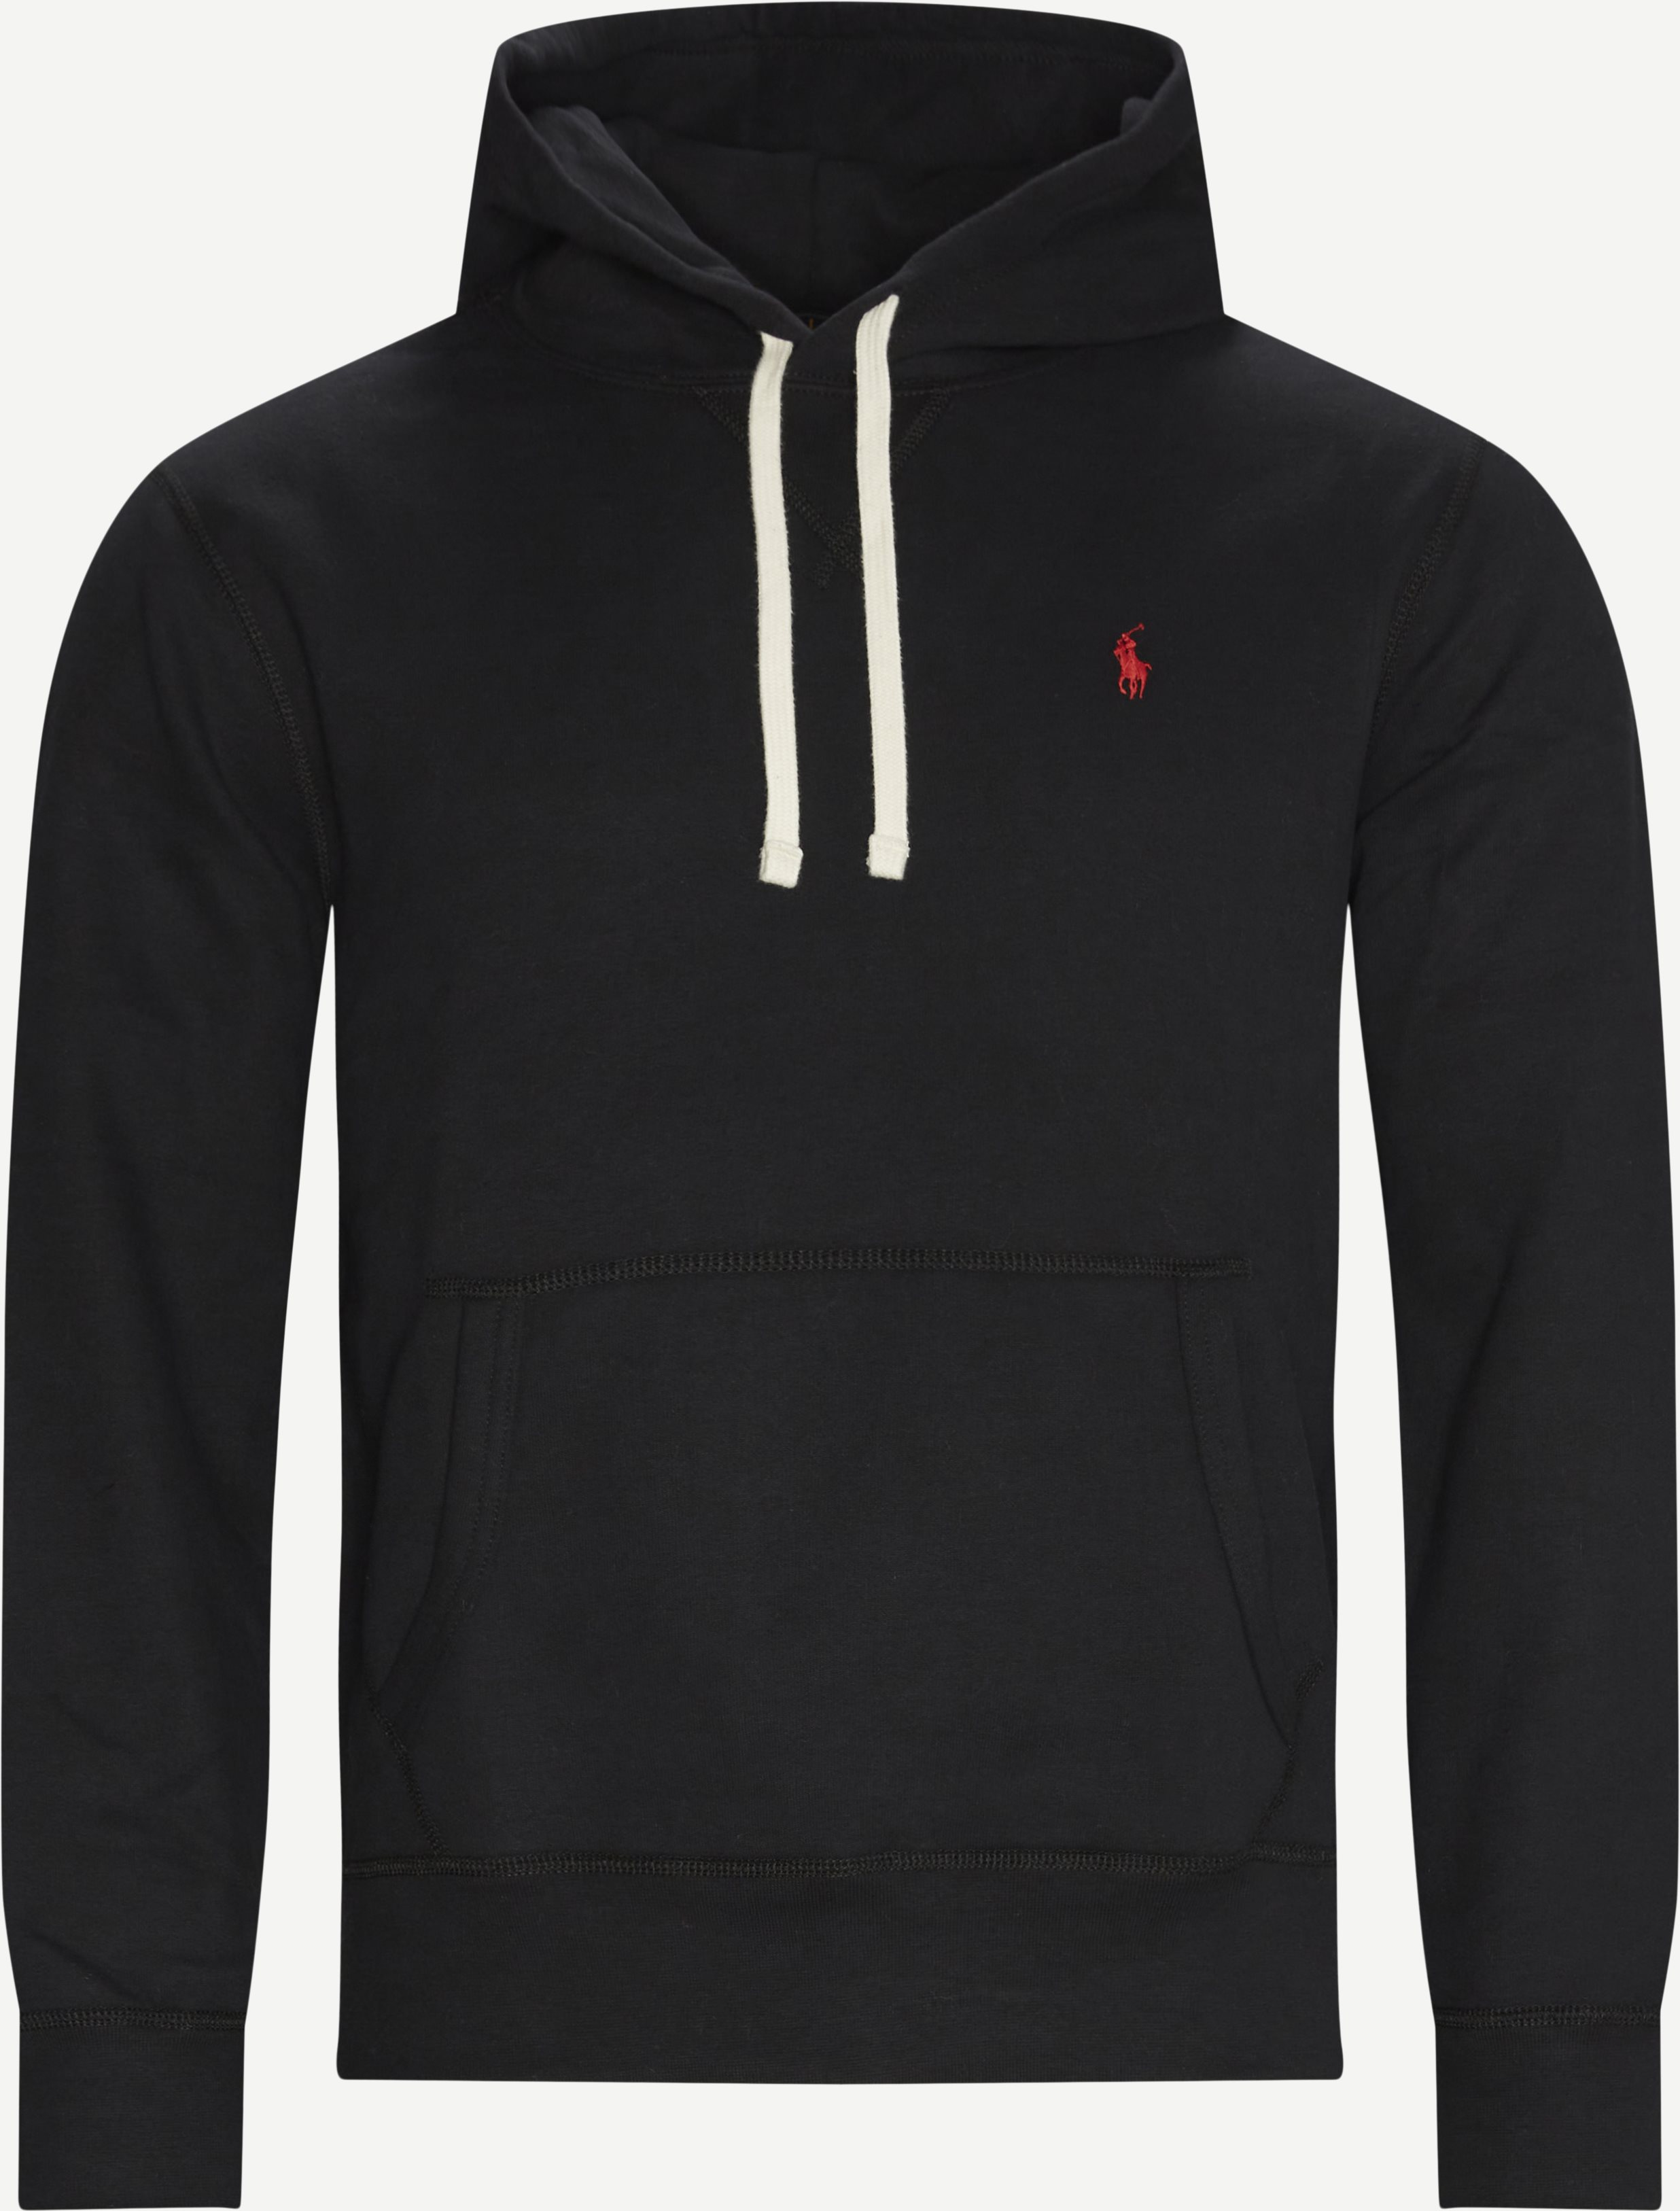 Hooded Sweatshirt - Sweatshirts - Regular fit - Black